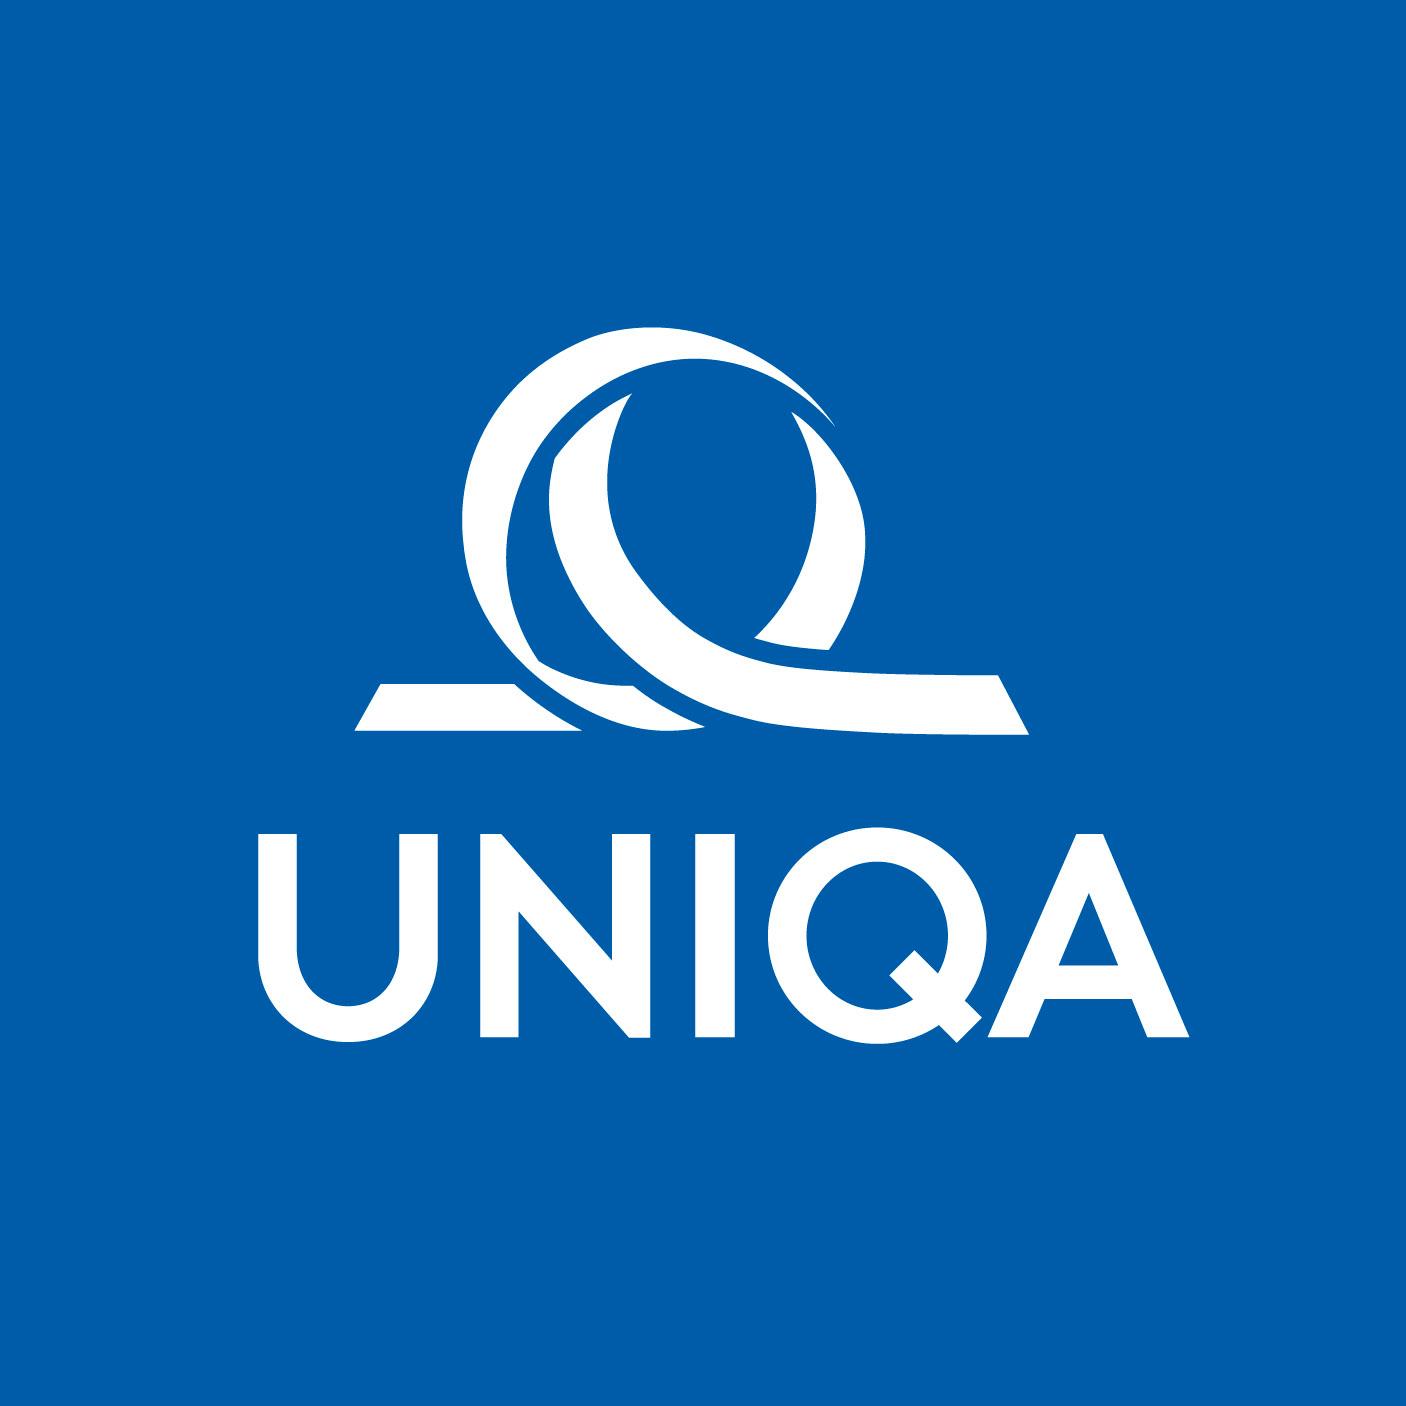 UNIQA ServiceCenter & KFZ Zulassungsstelle Donaucity